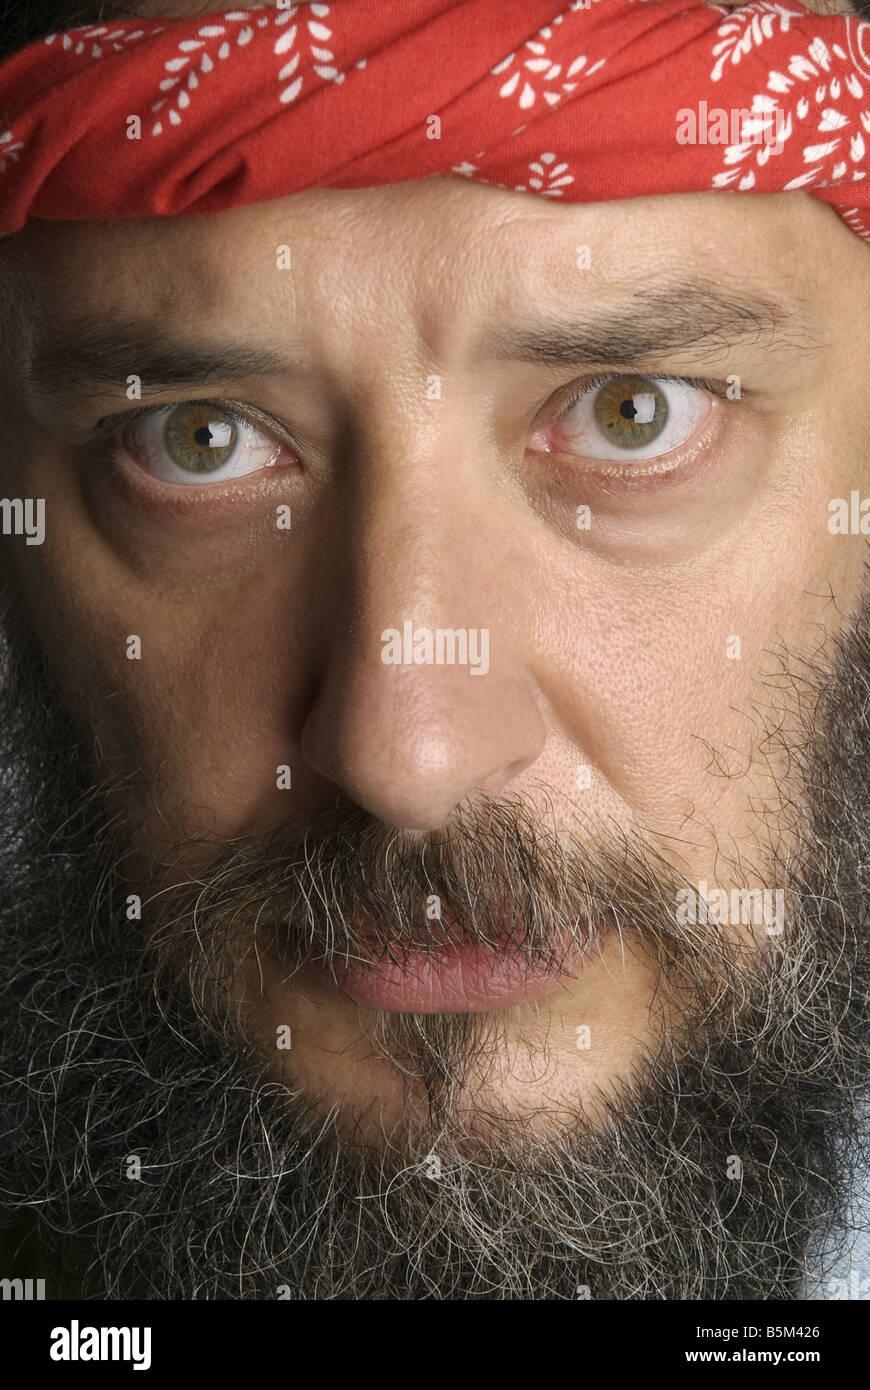 Man with long hair and beard. - Stock Image